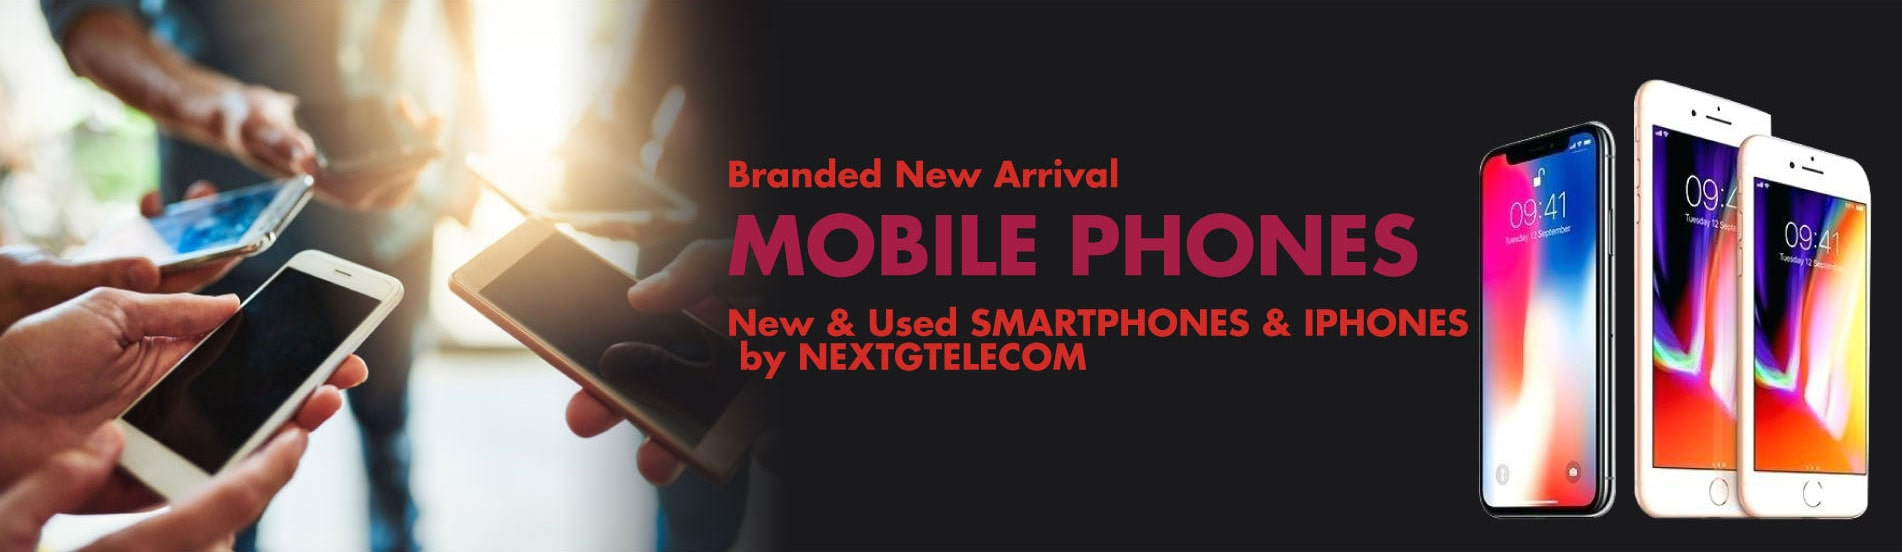 Mobile Background Image